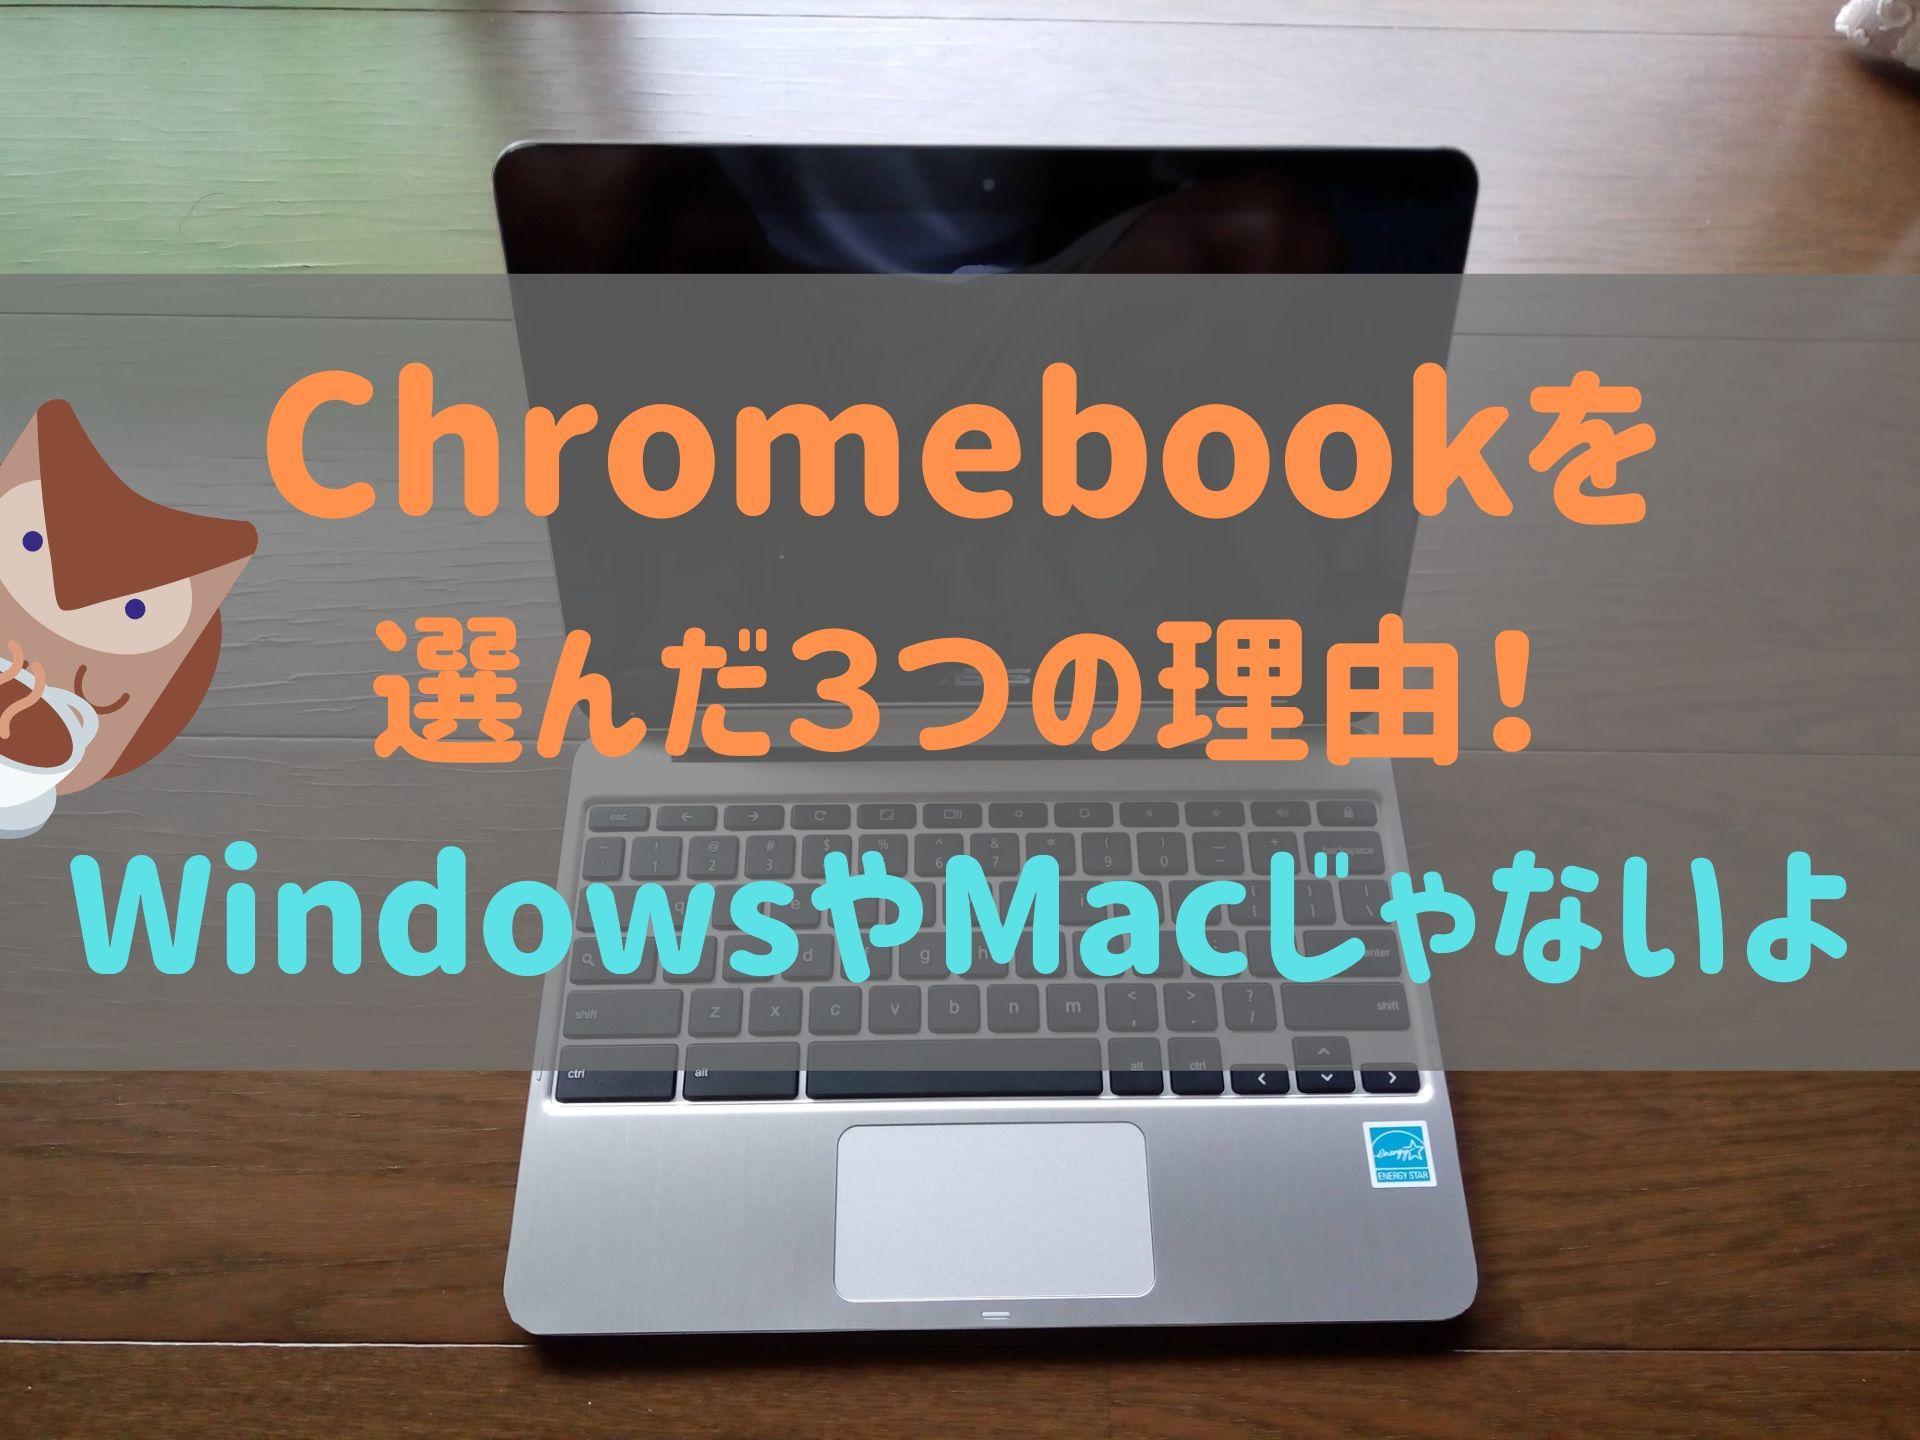 Chromebookを選んだ3つの理由